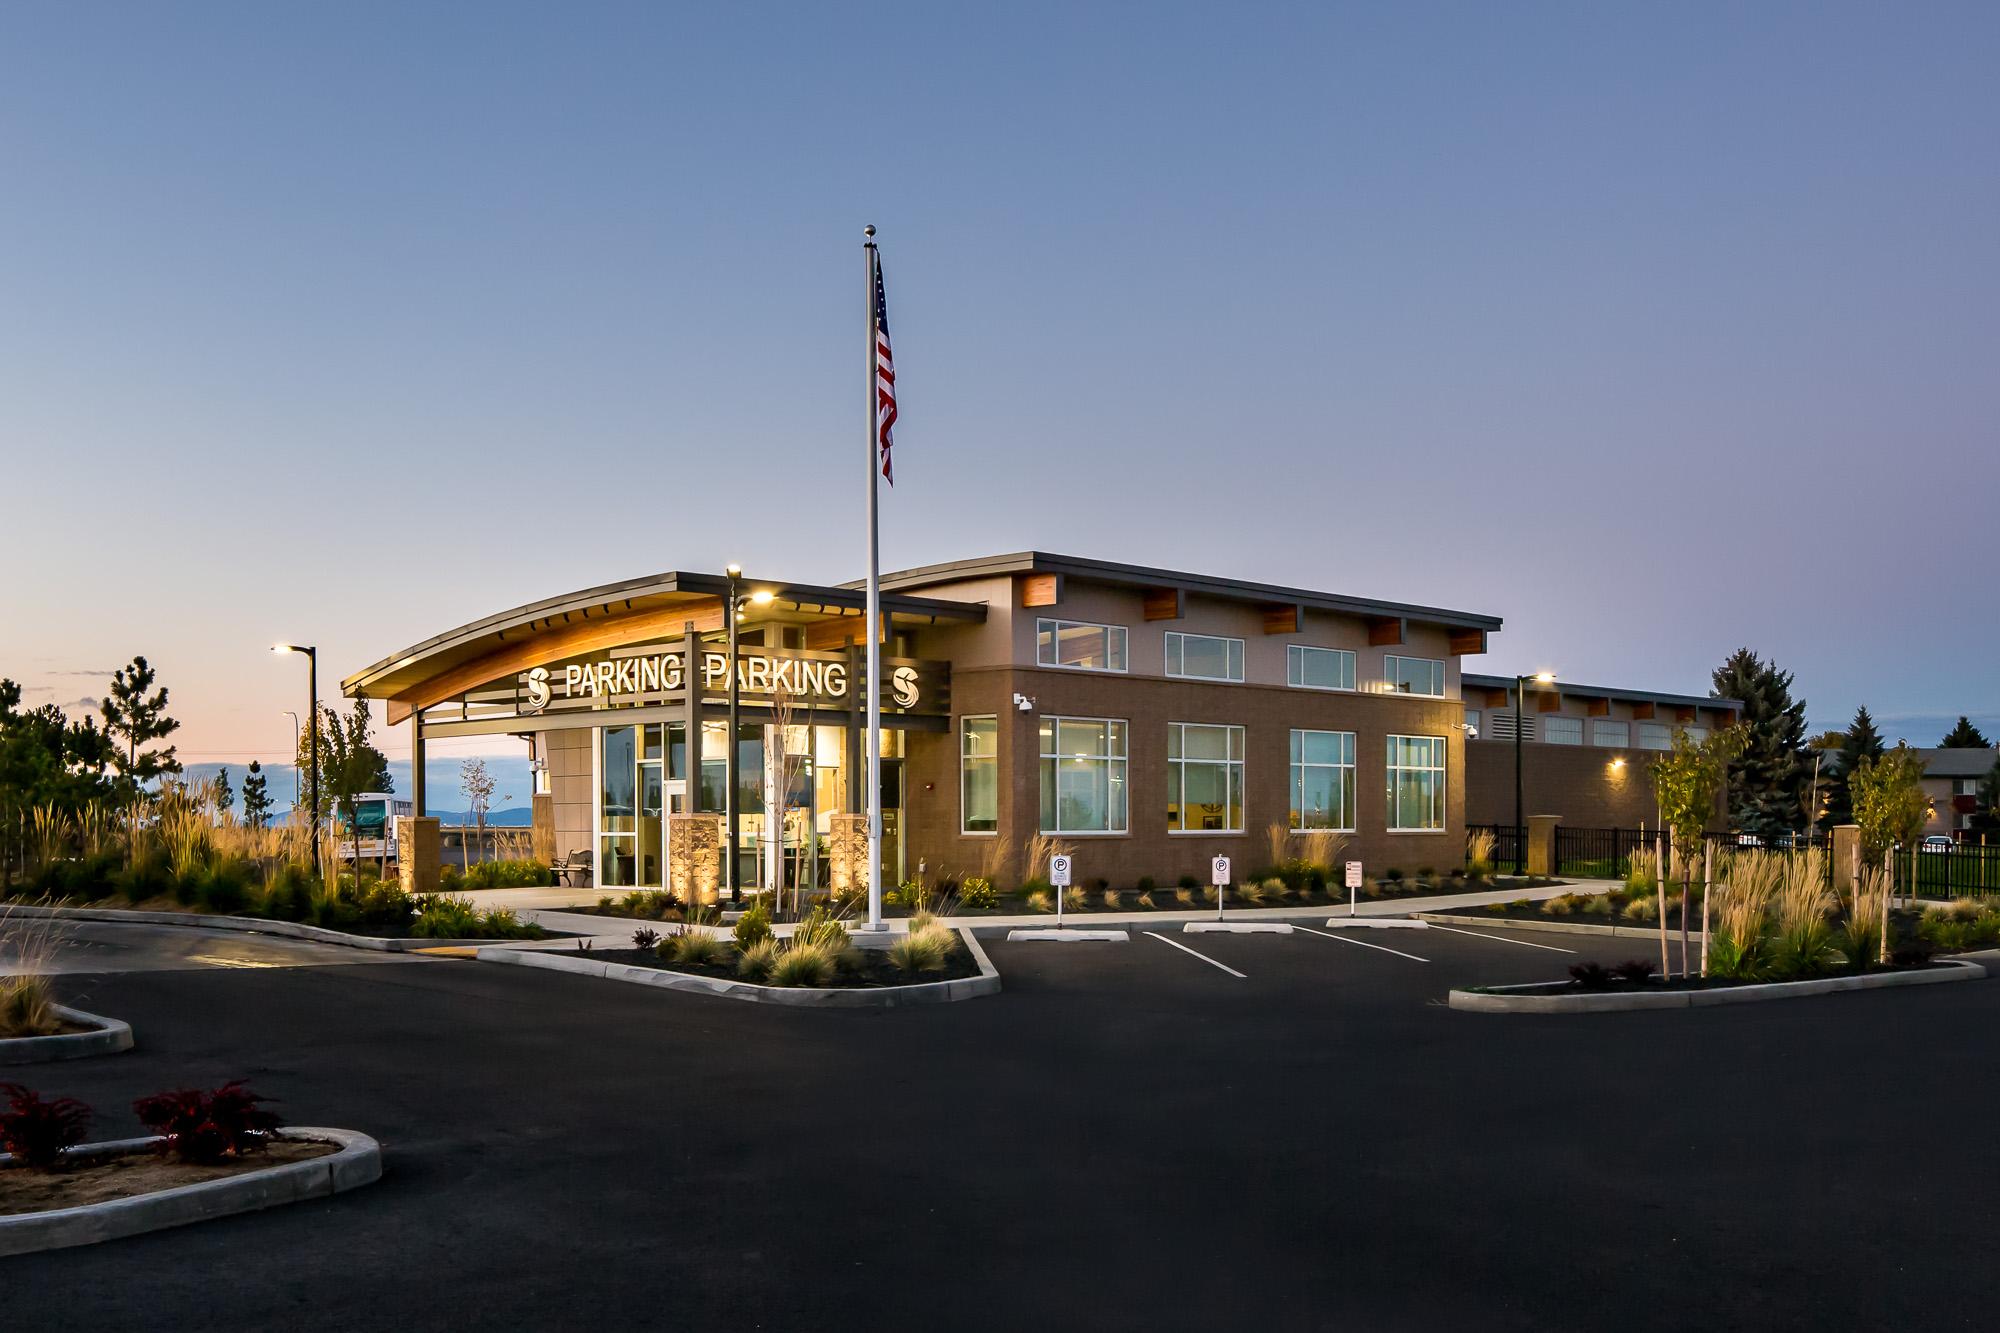 Spokane International Airport Parking Rl Miller